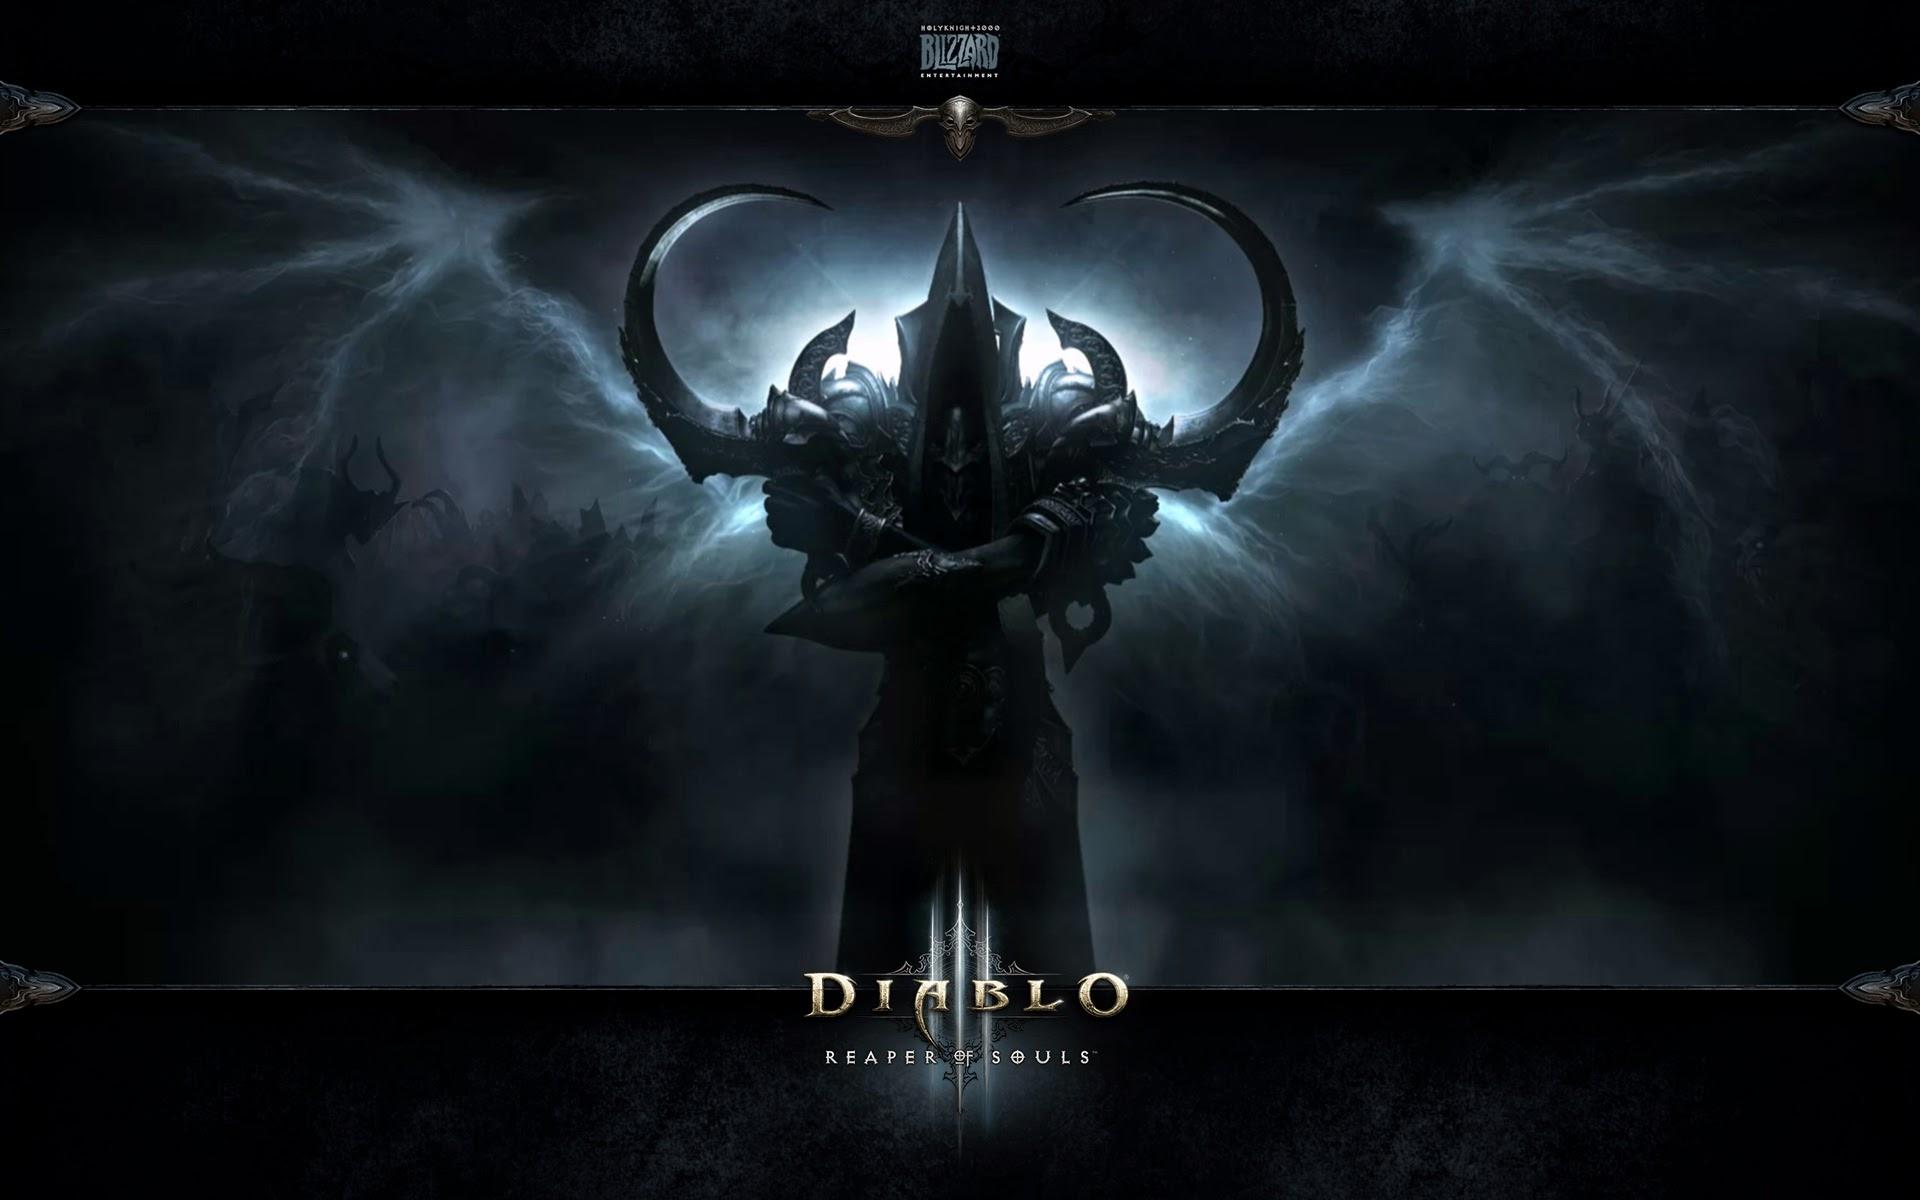 diablo 3 reaper of souls expansion hd wallpaper game 1920x1200 1920x1200